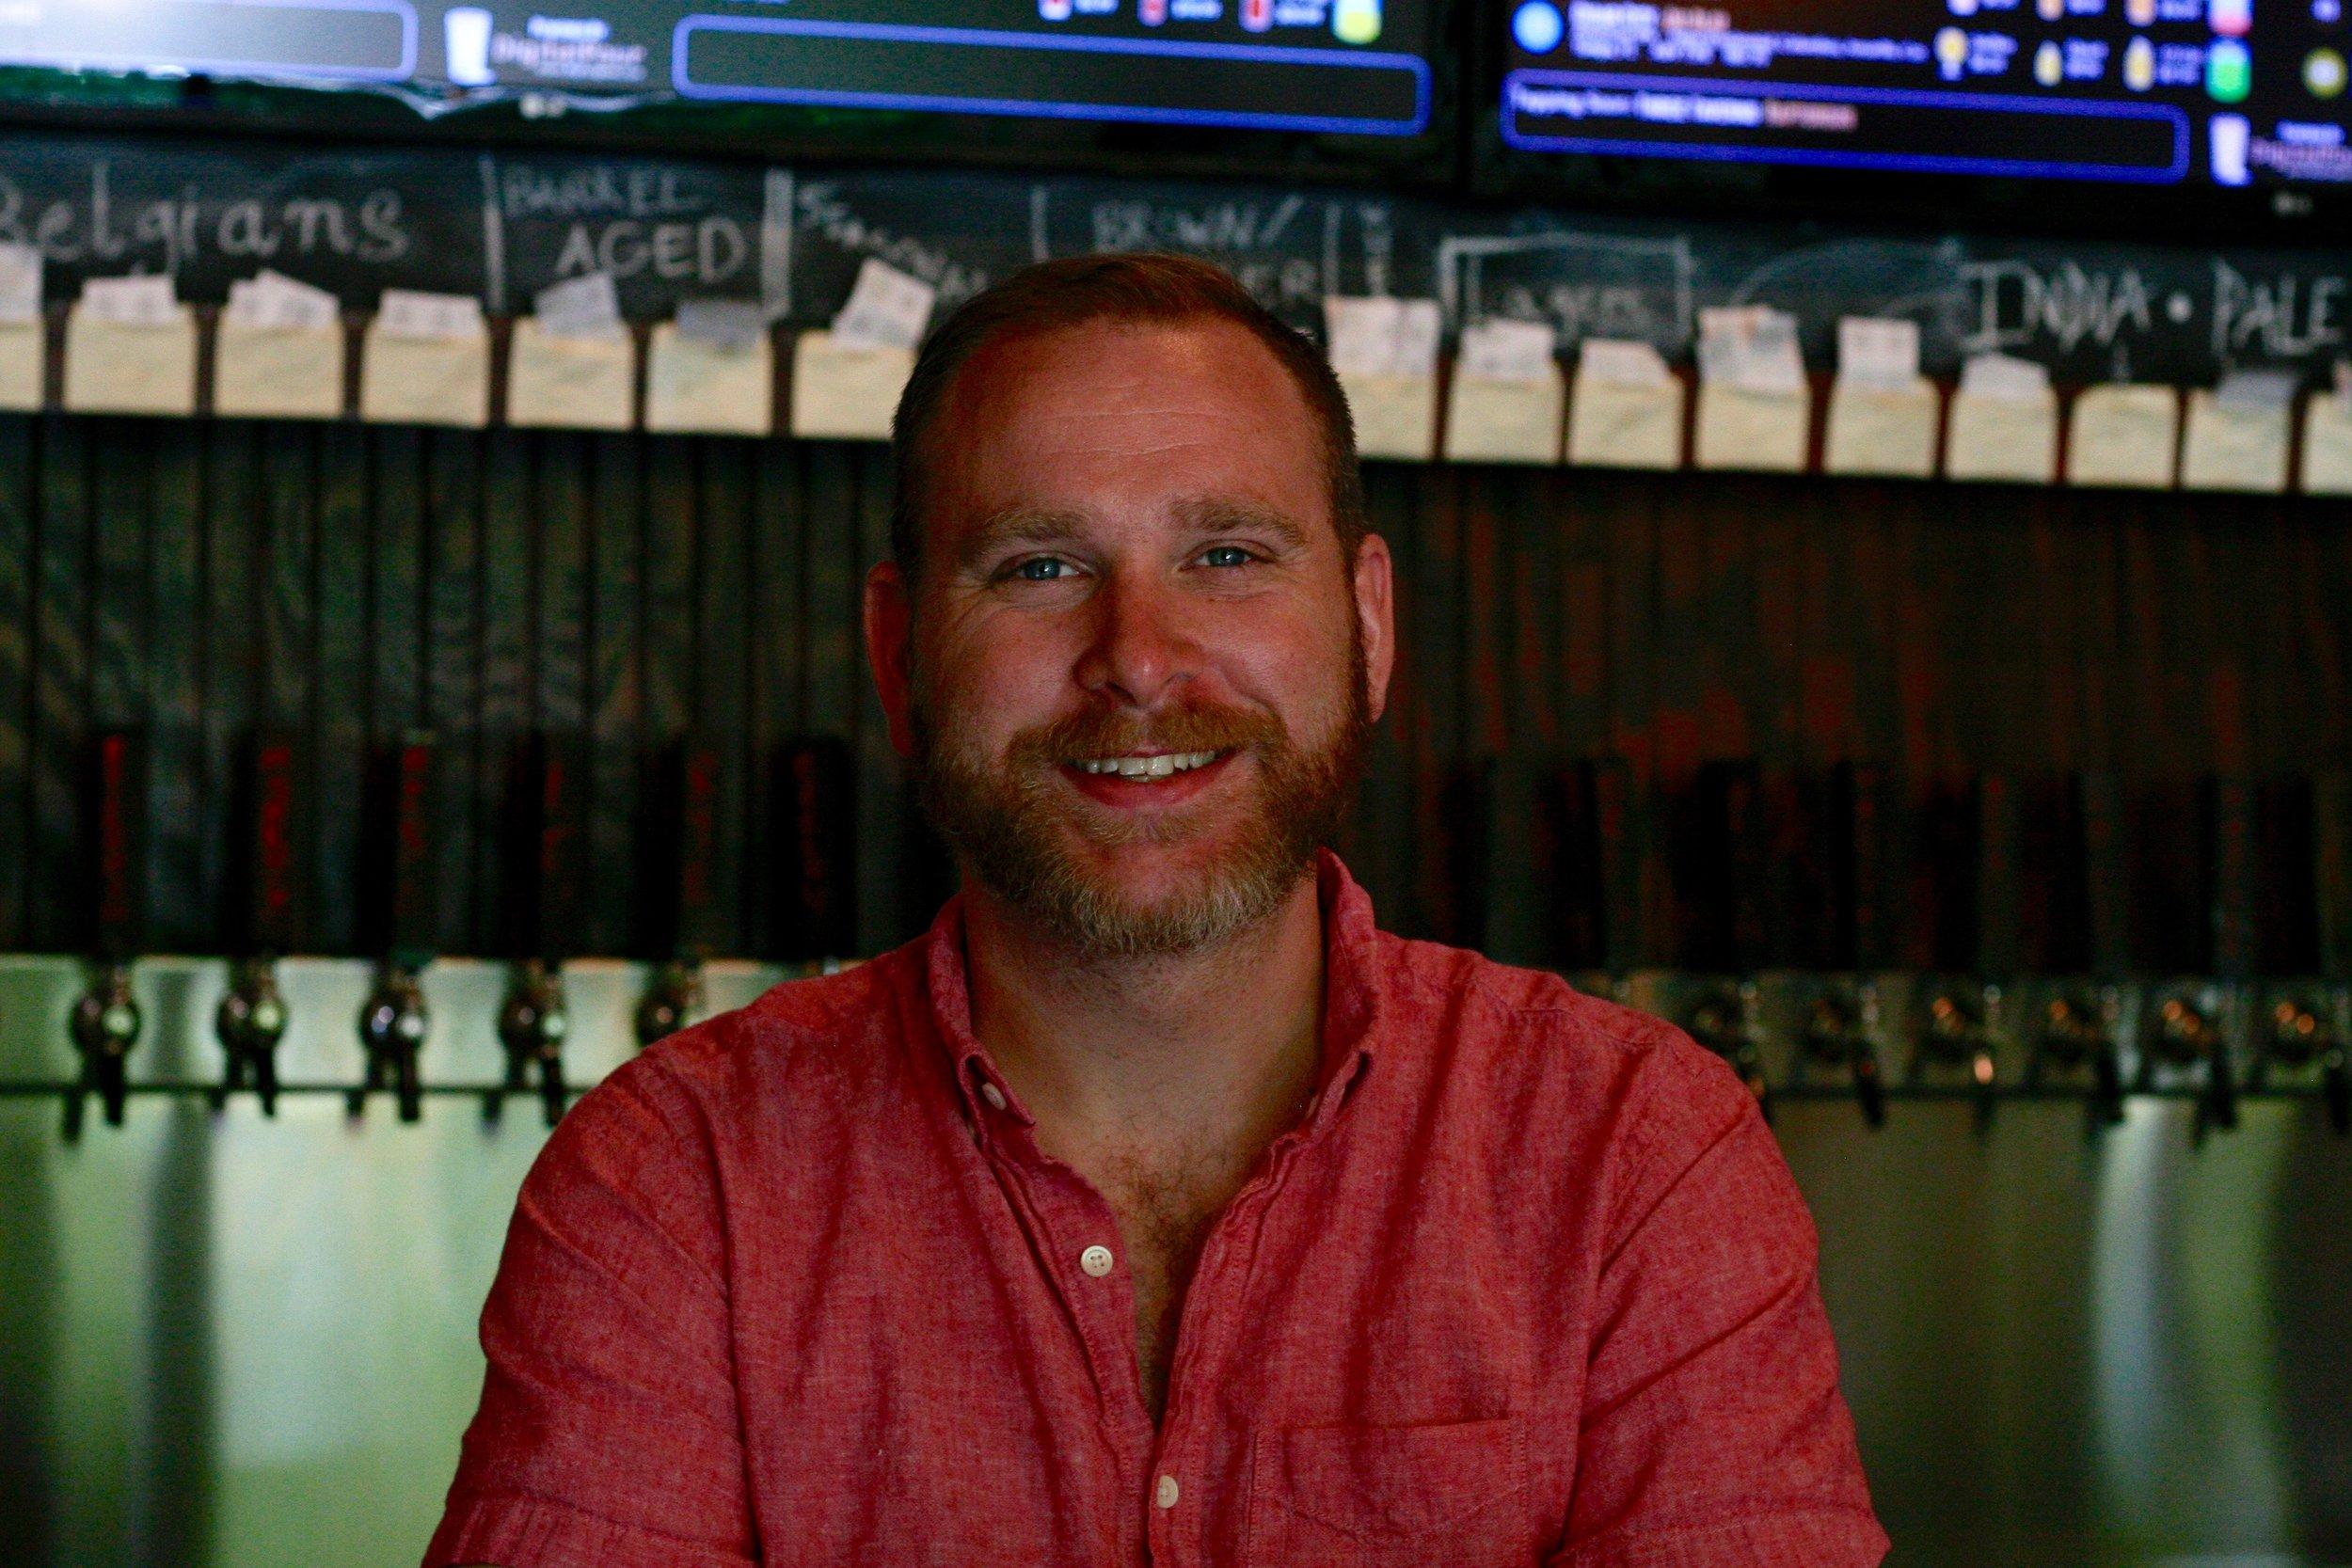 Mark Sims - Owner & Operator